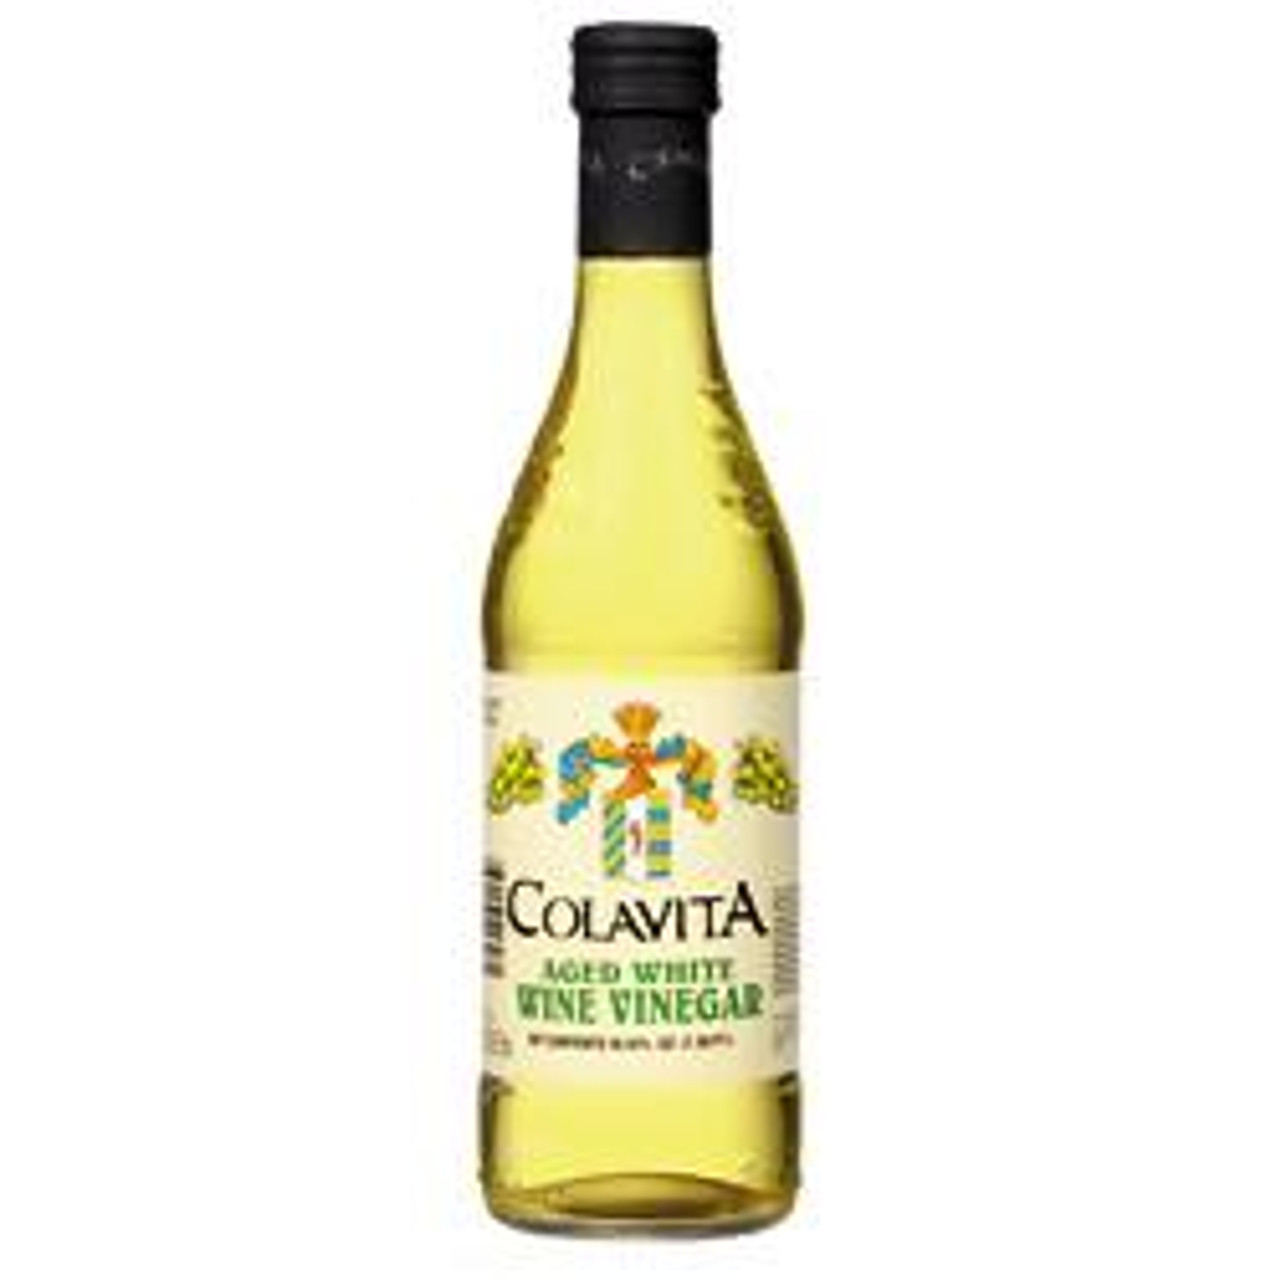 Colavita White Wine Vinegar